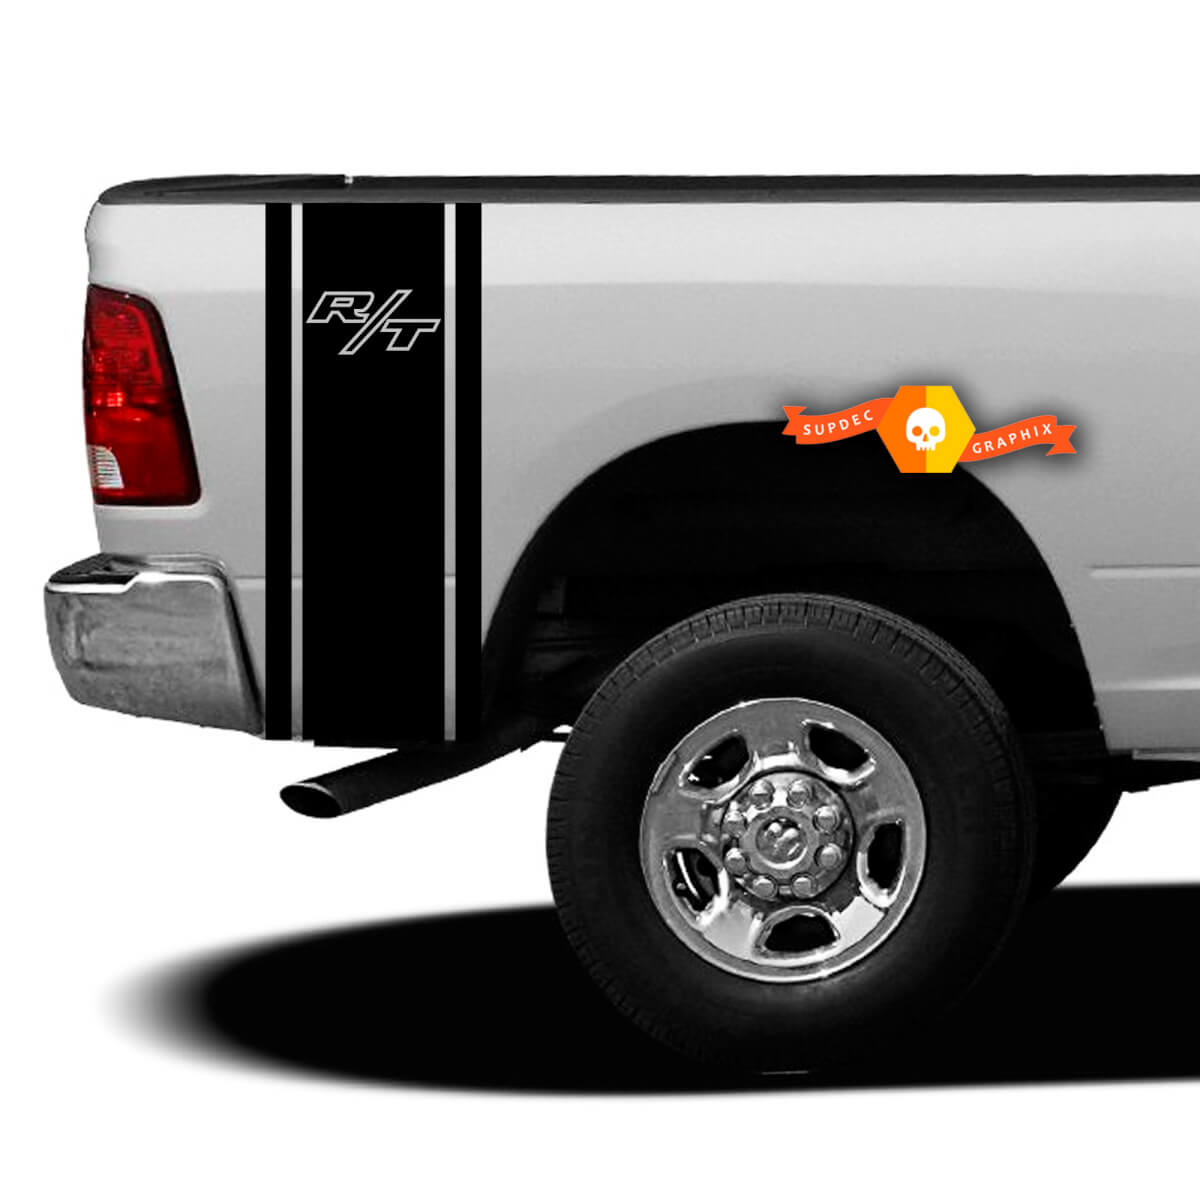 Auto Parts And Vehicles Dodge Ram 1500 2500 3500 Vinyl Decal Racing Sticker Stripe Hemi Mopar 5 7l T 192 Car Truck Graphics Decals